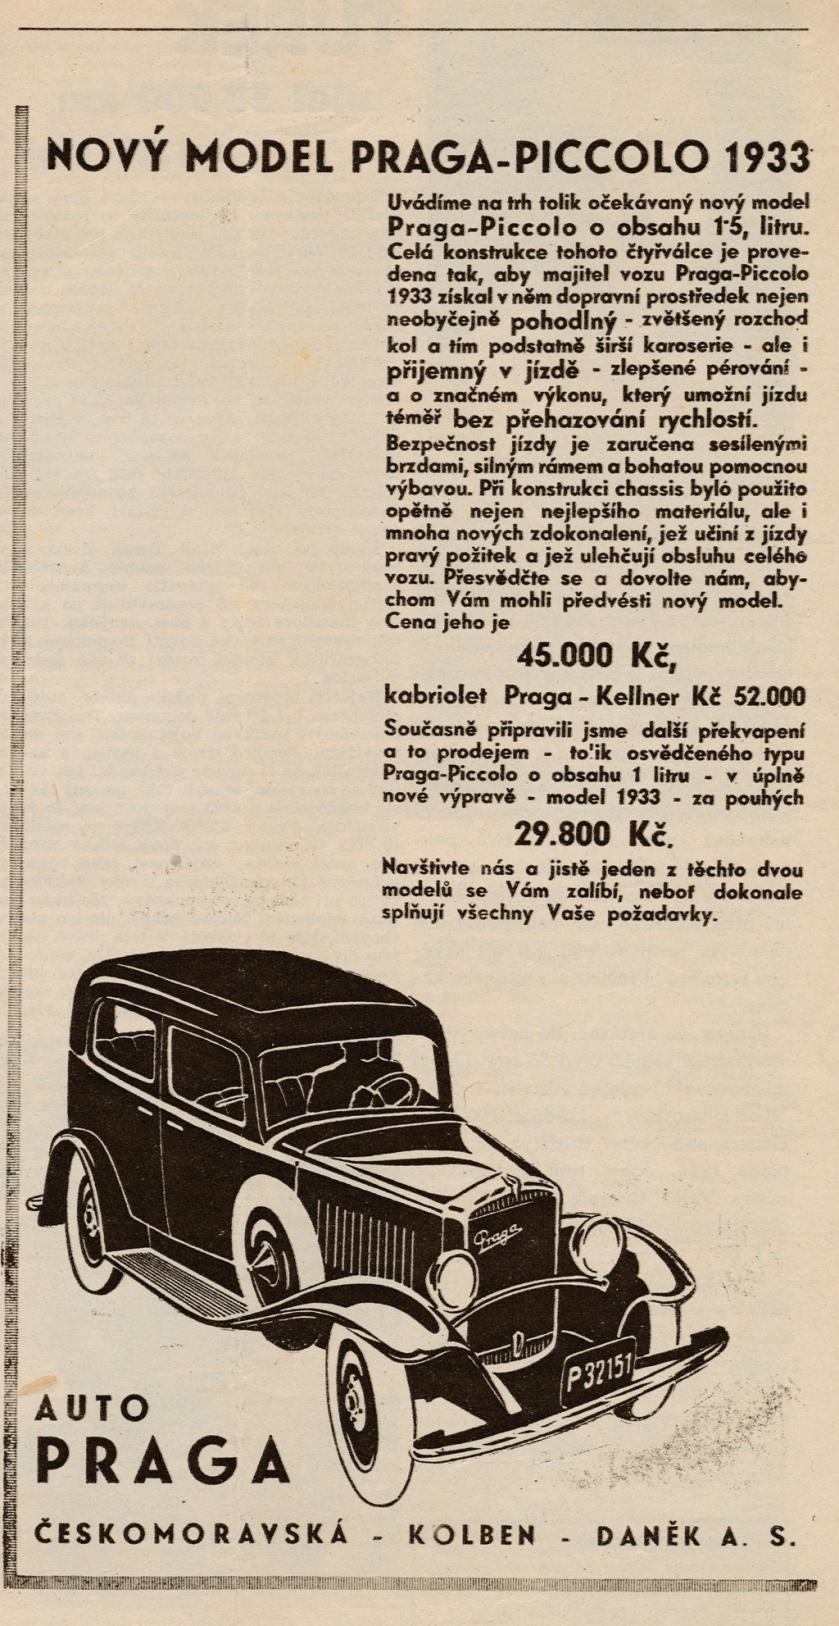 1932 Praga Piccolo 8-1932